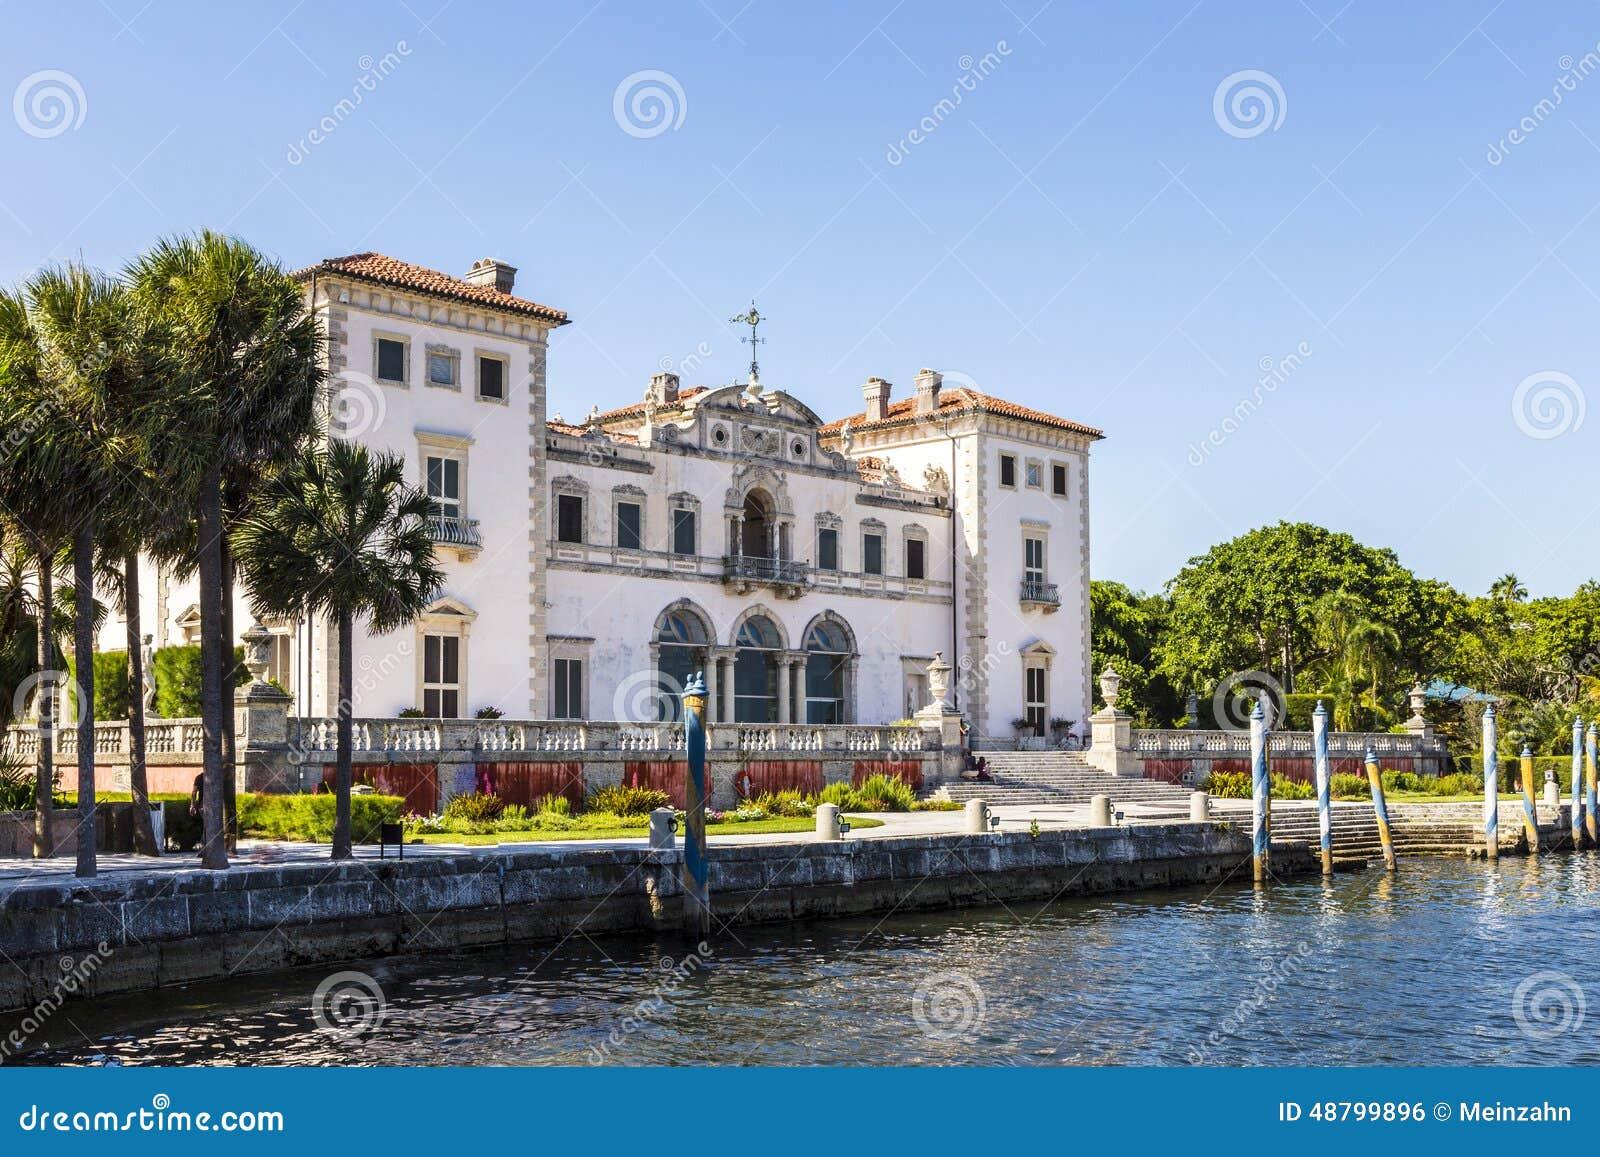 Vizcaya museum and gardens in miami florida stock photo image